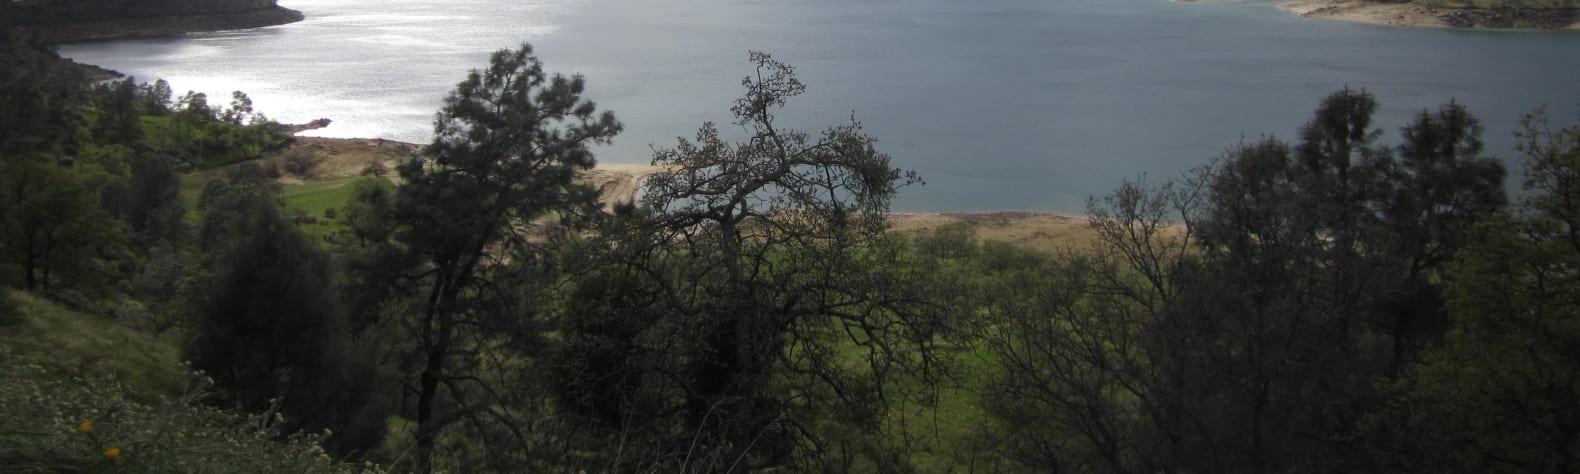 Millerton Lake State Recreation Area